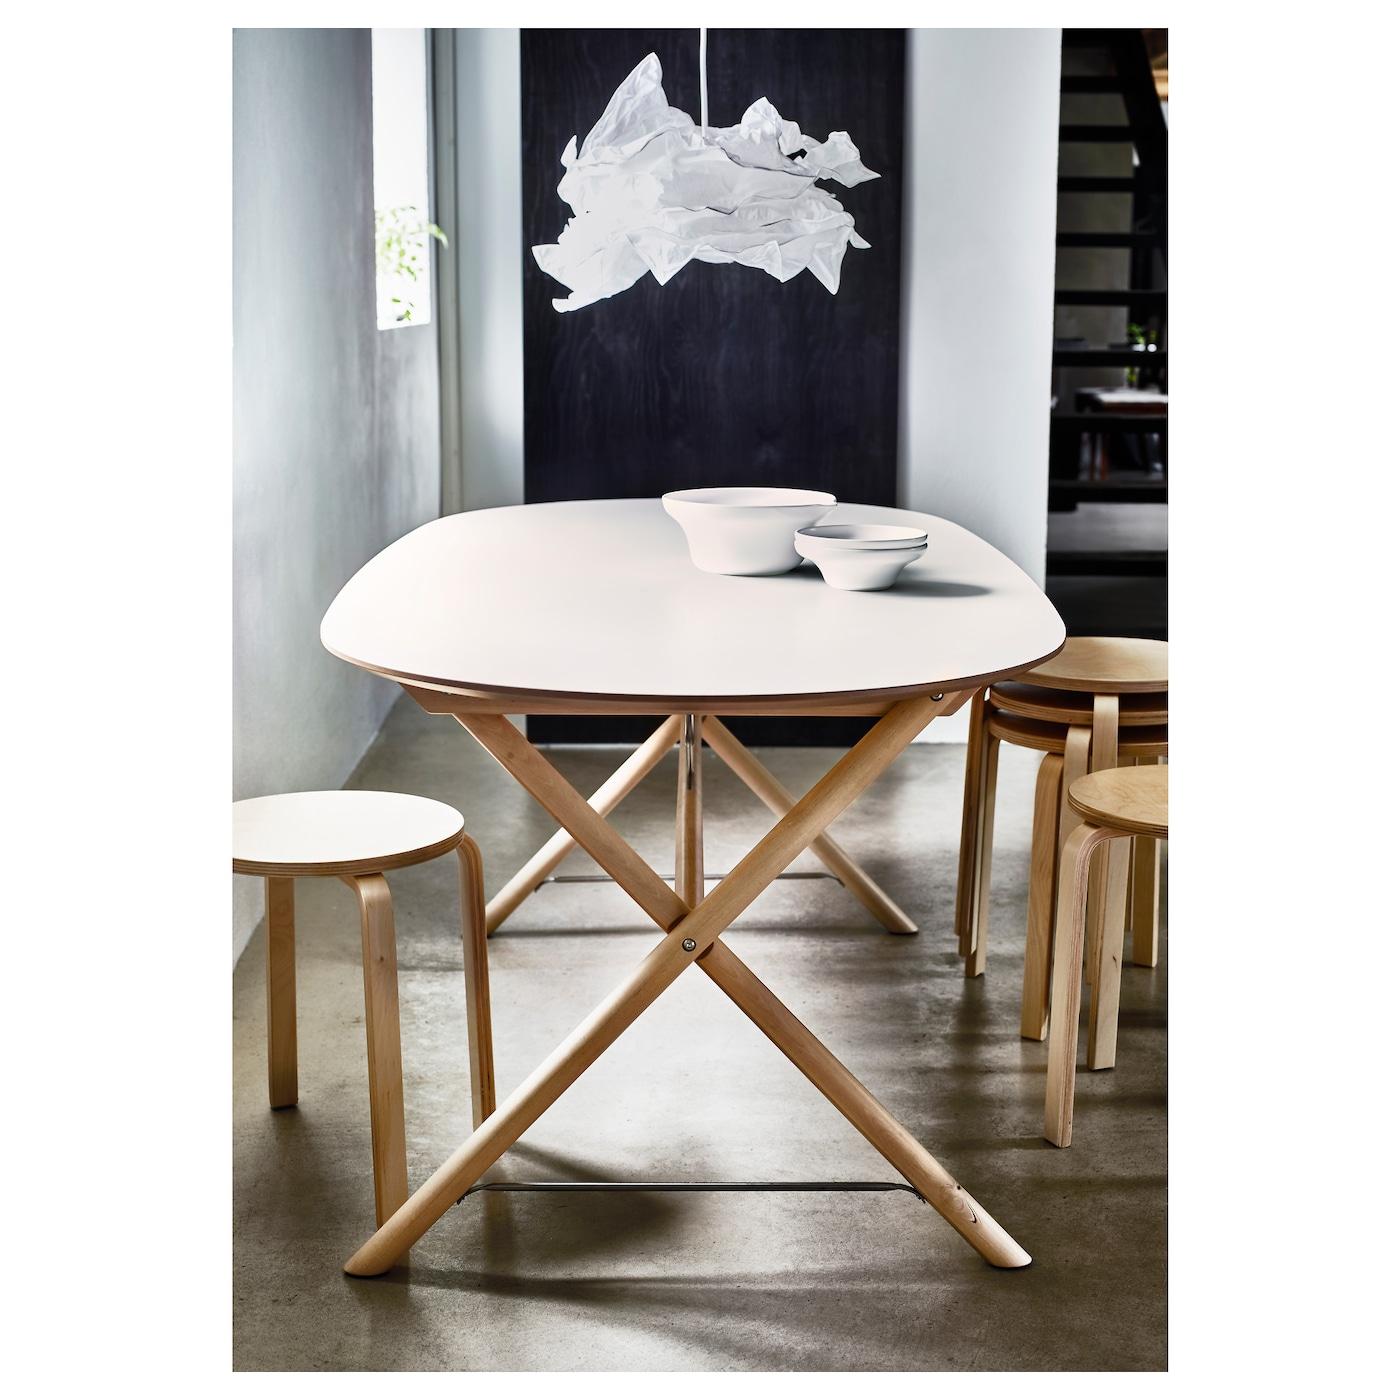 Hemnes Coffee Table White Stain 90 X 90 Cm: SLÄHULT Table White/dalshult Birch 185 X 90 Cm